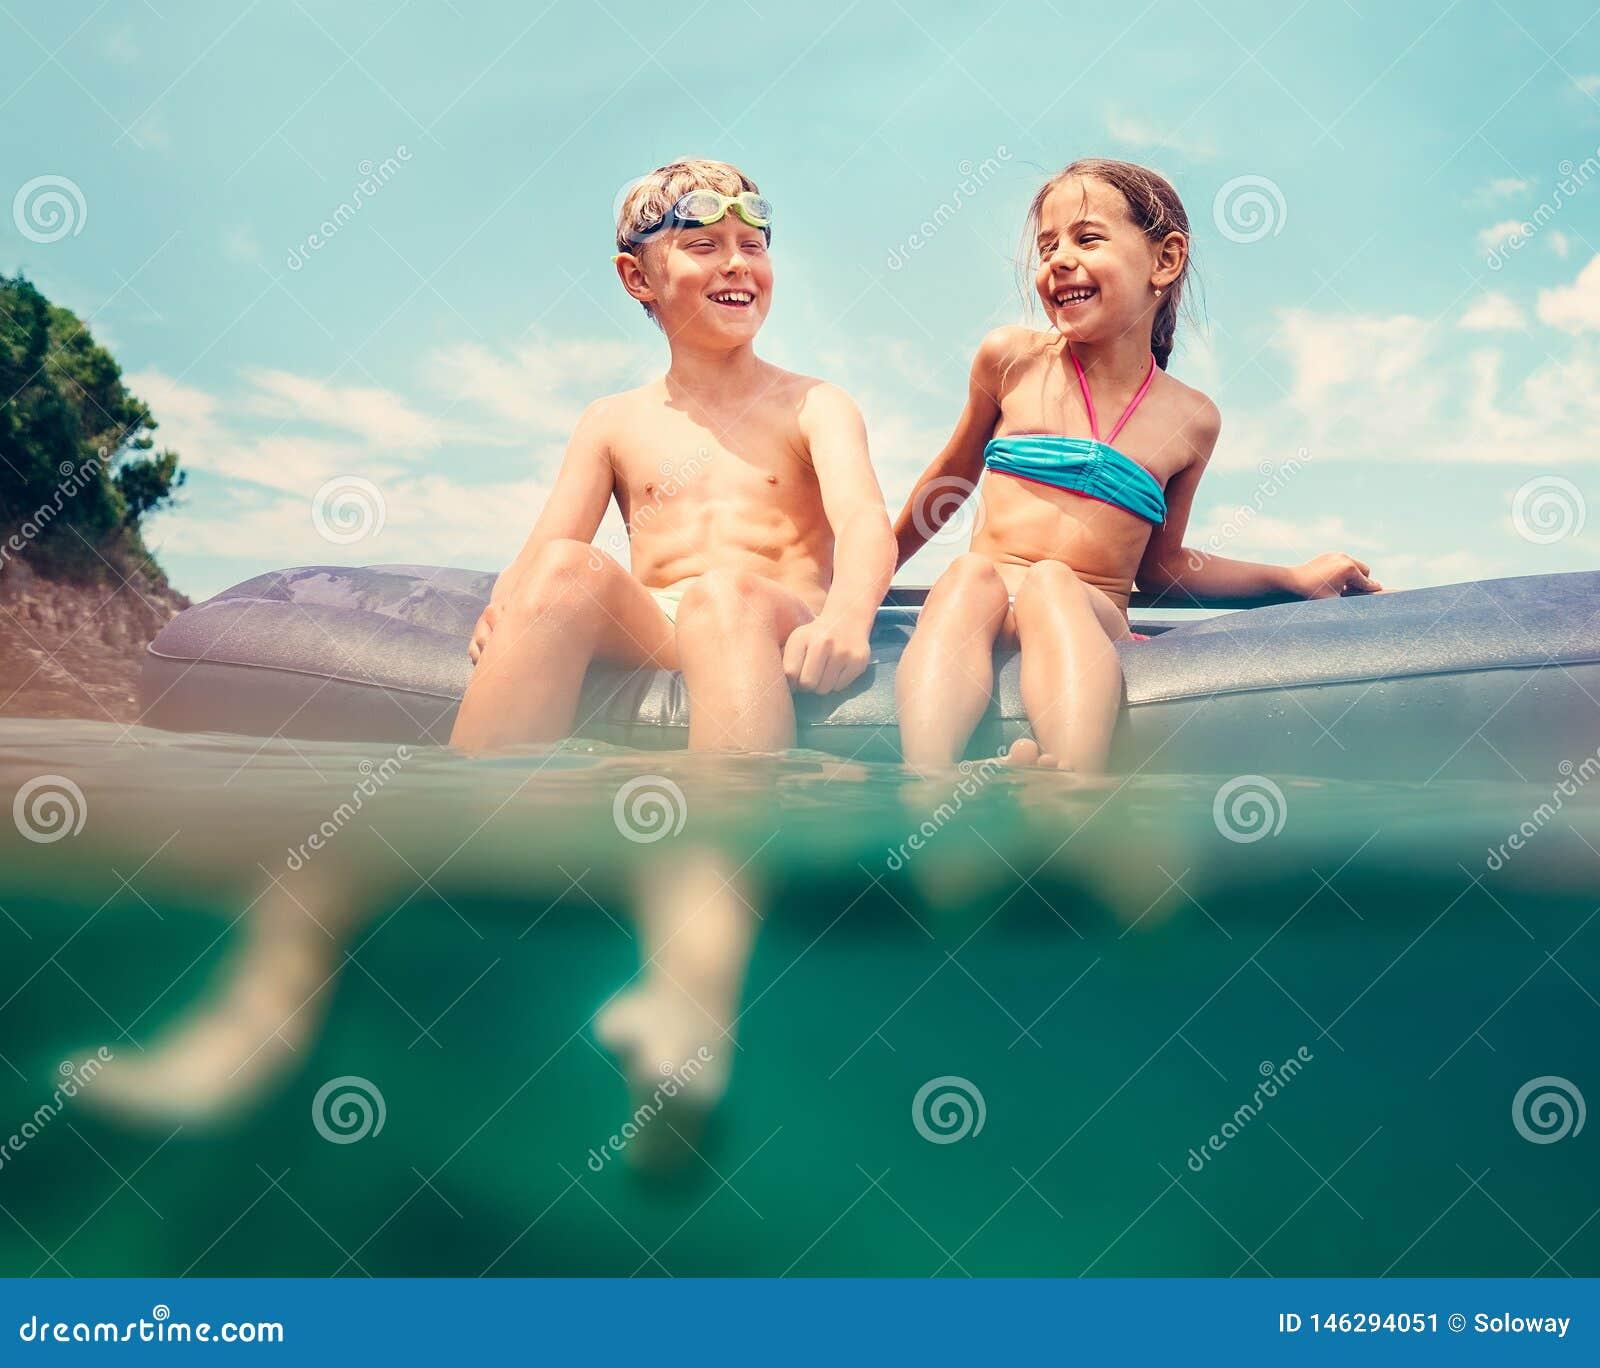 Siostry i brata obsiadanie na nadmuchiwanej materac i cieszy? si? wod? morsk?, rado?nie ?mia si? gdy p?ywanie w morzu niestaranny